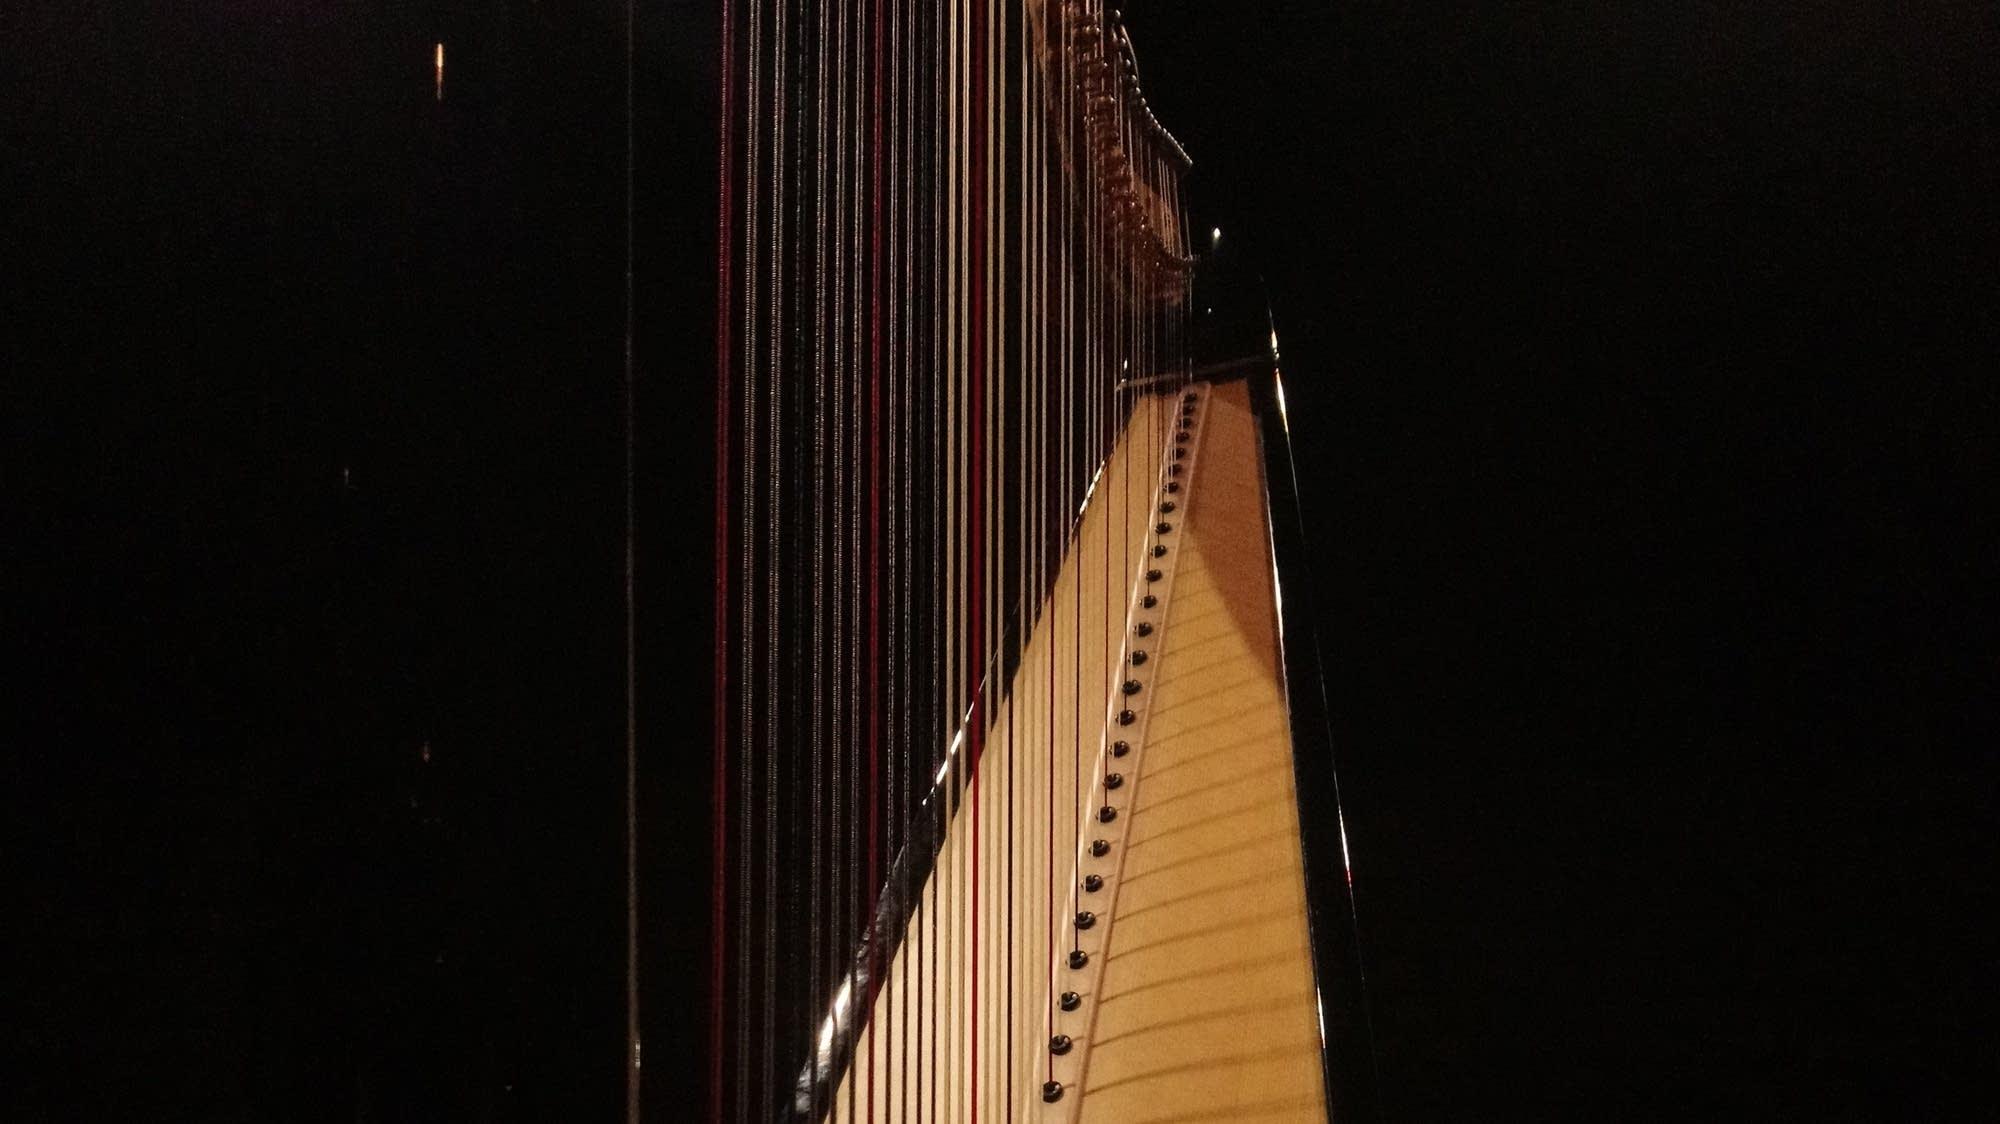 Black harp in shadows